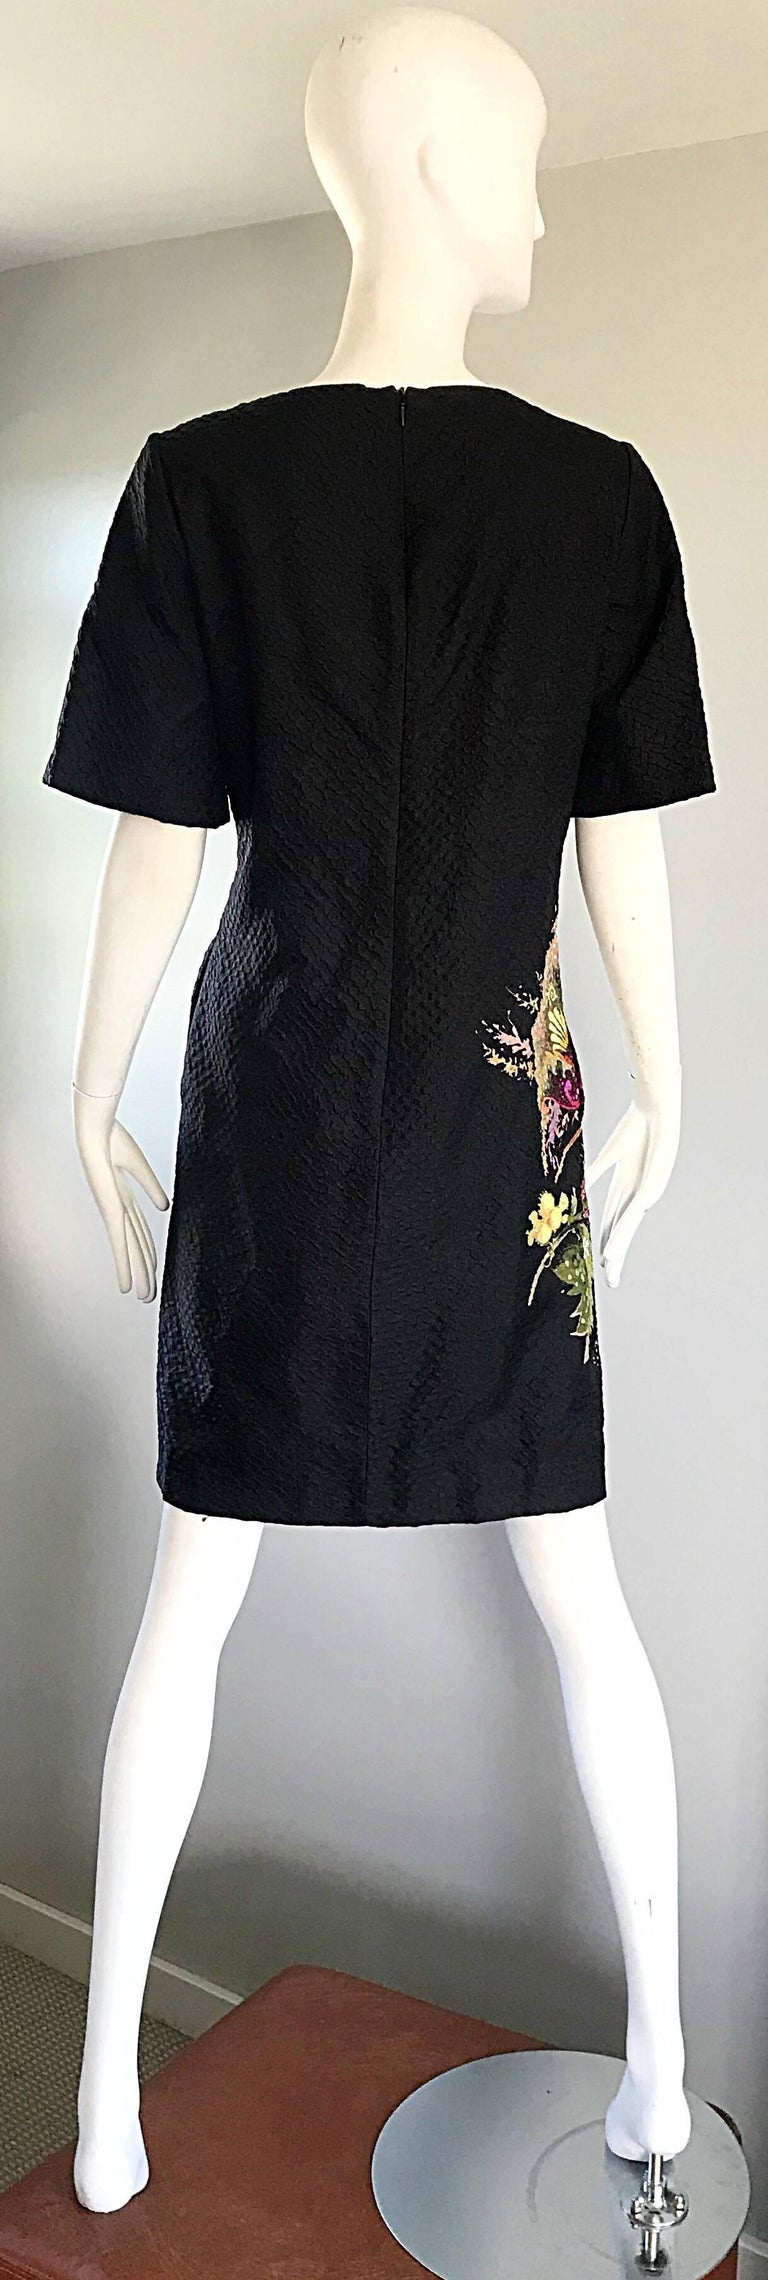 Vintage Etro 1990s Black Silk Size 40 Floral Print Short Sleeve 90s Shift Dress For Sale 4